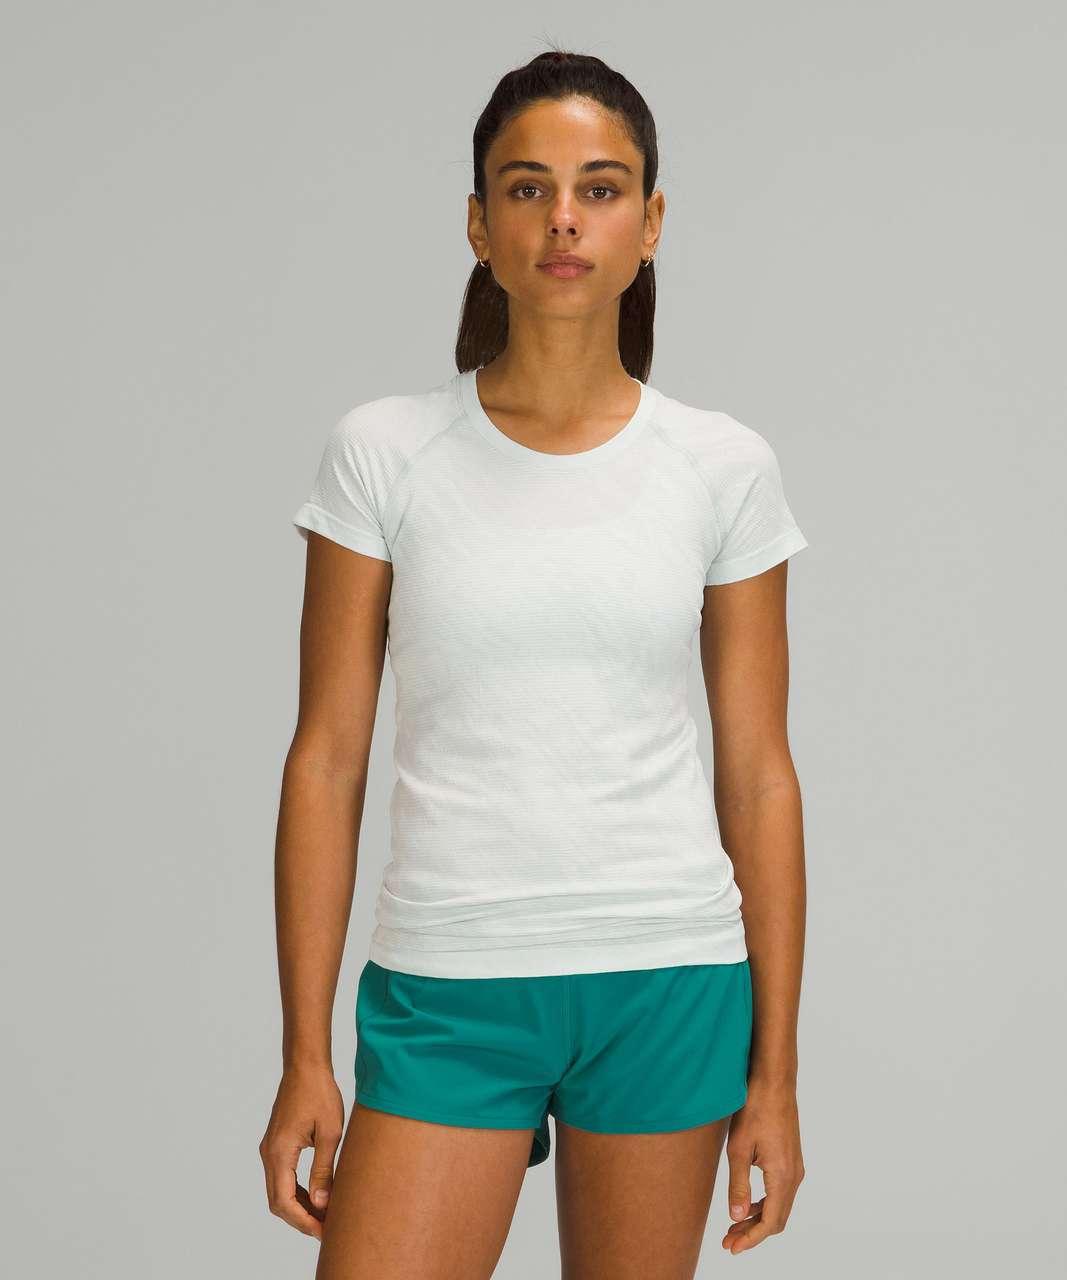 Lululemon Swiftly Tech Short Sleeve Shirt 2.0 - Mesh Camo Ocean Air / White